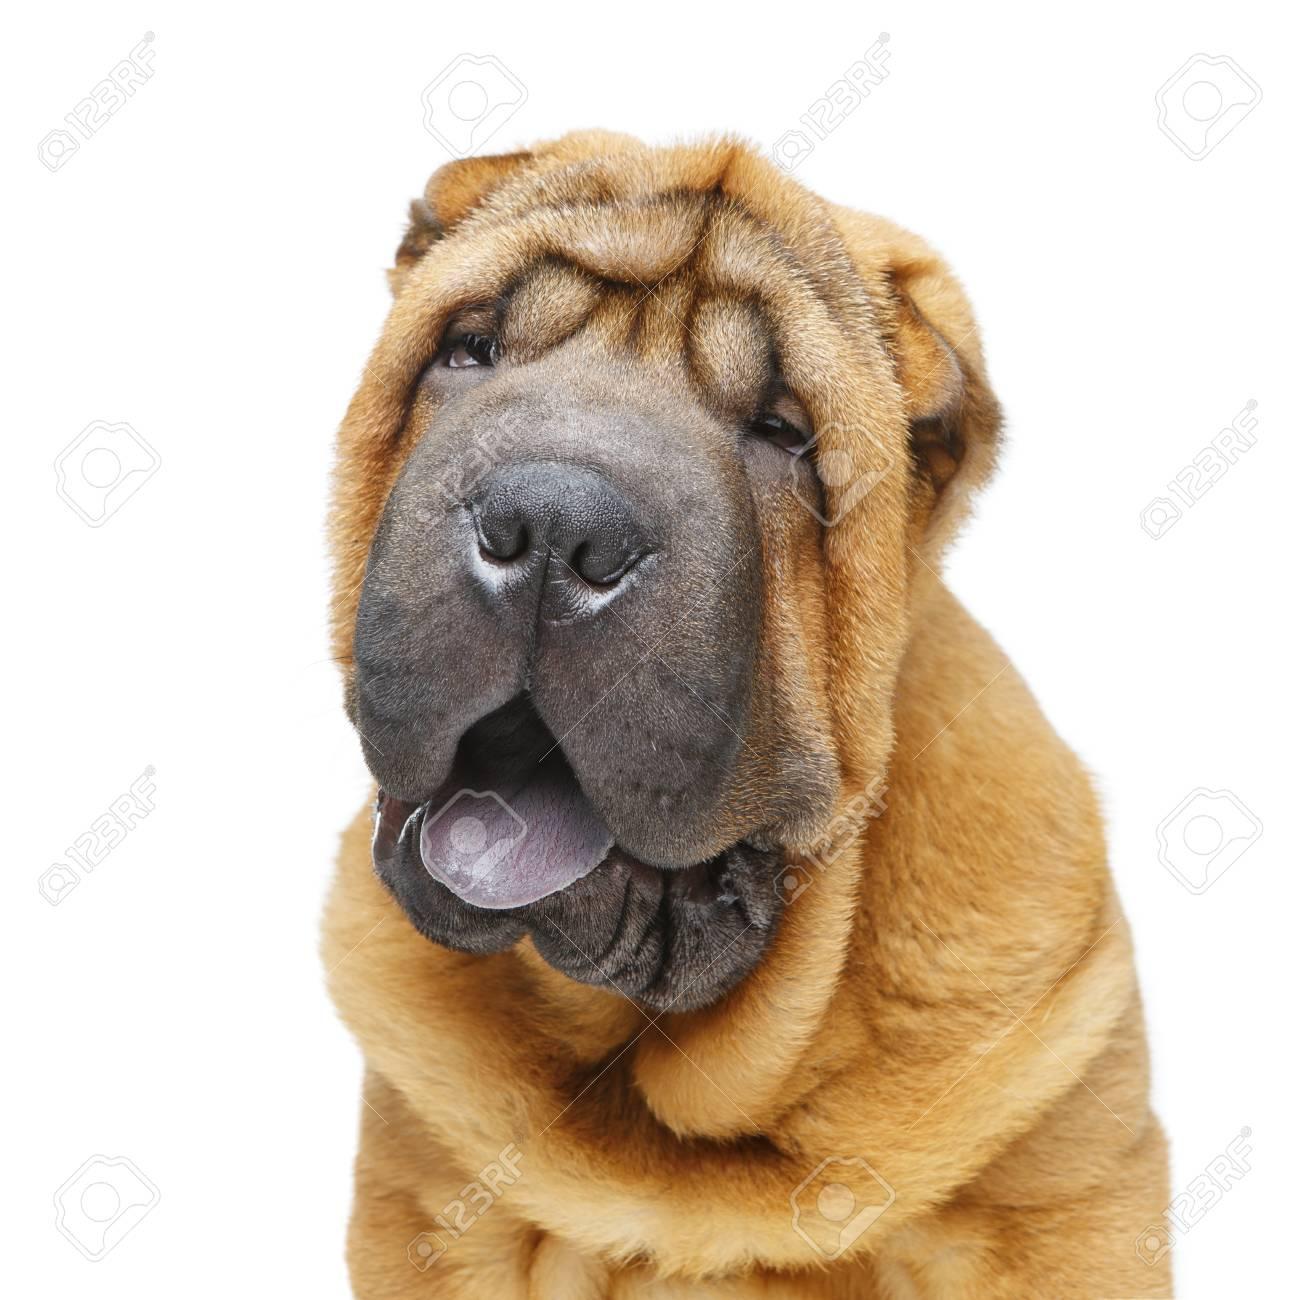 beautiful shar pei puppy - 92676887